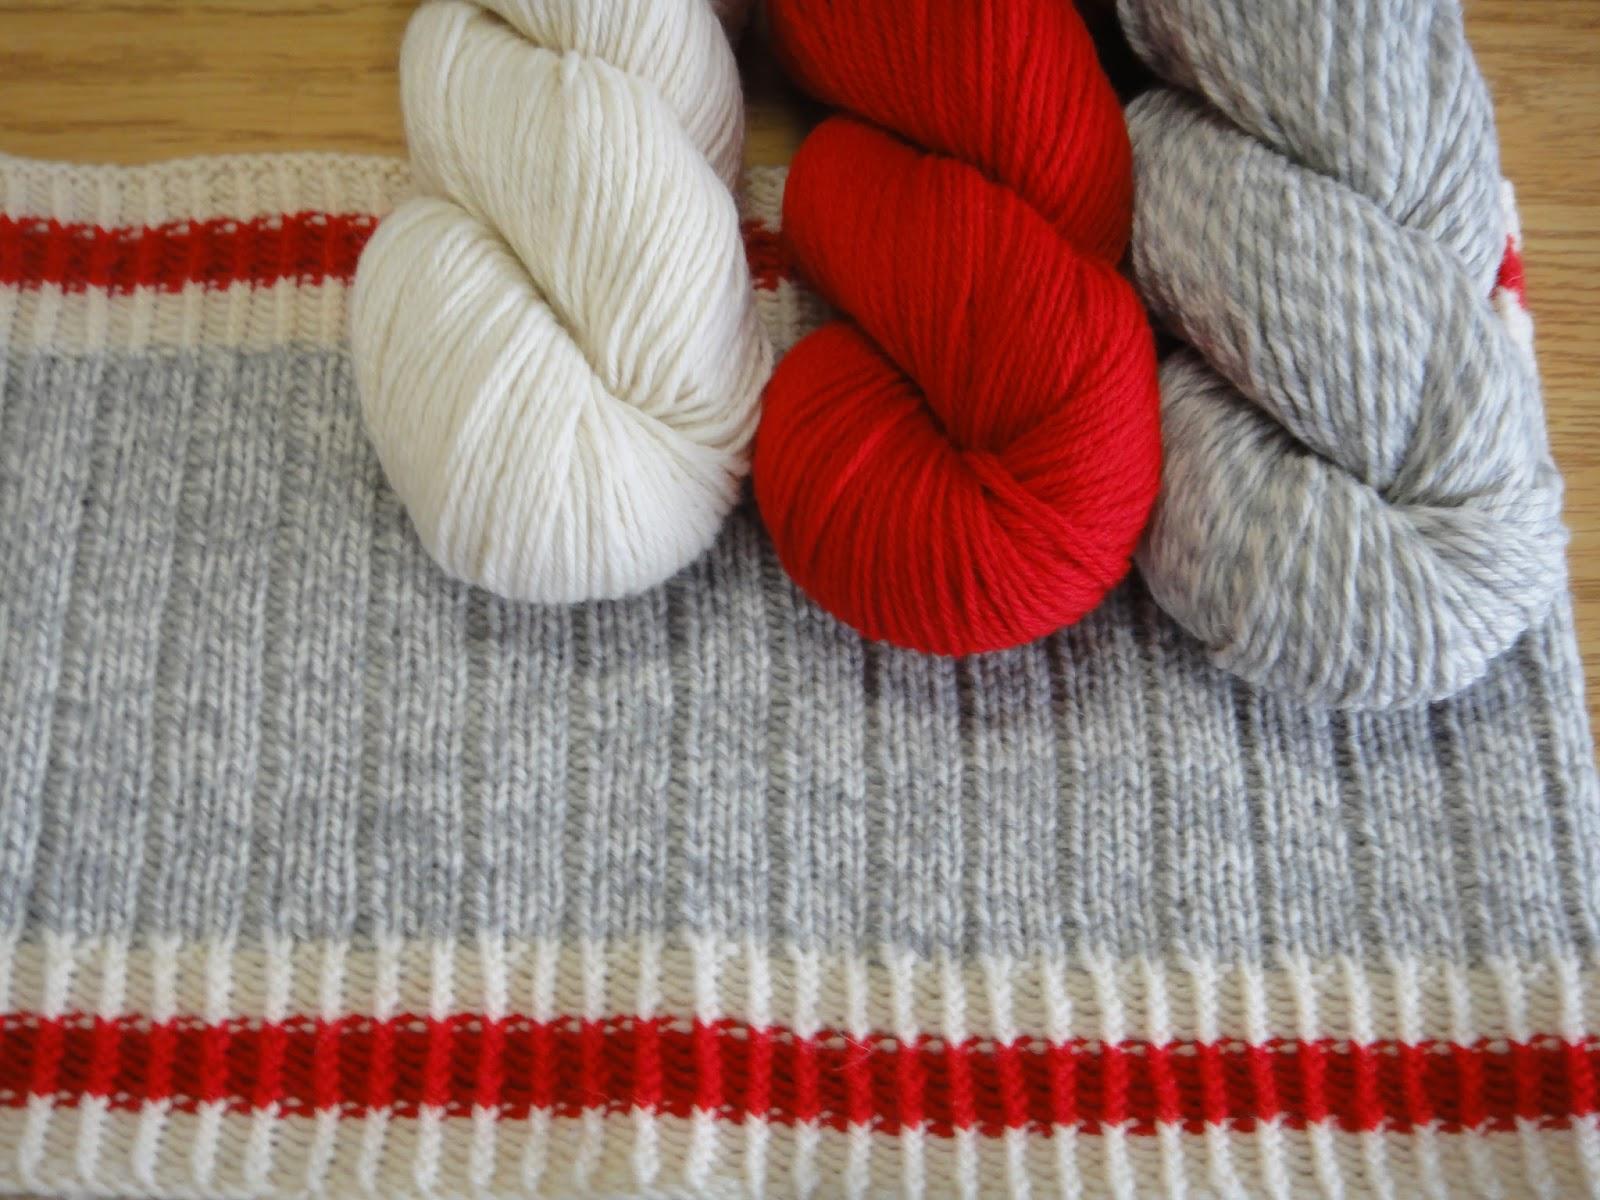 Serenity Knits: Work Sock Designs